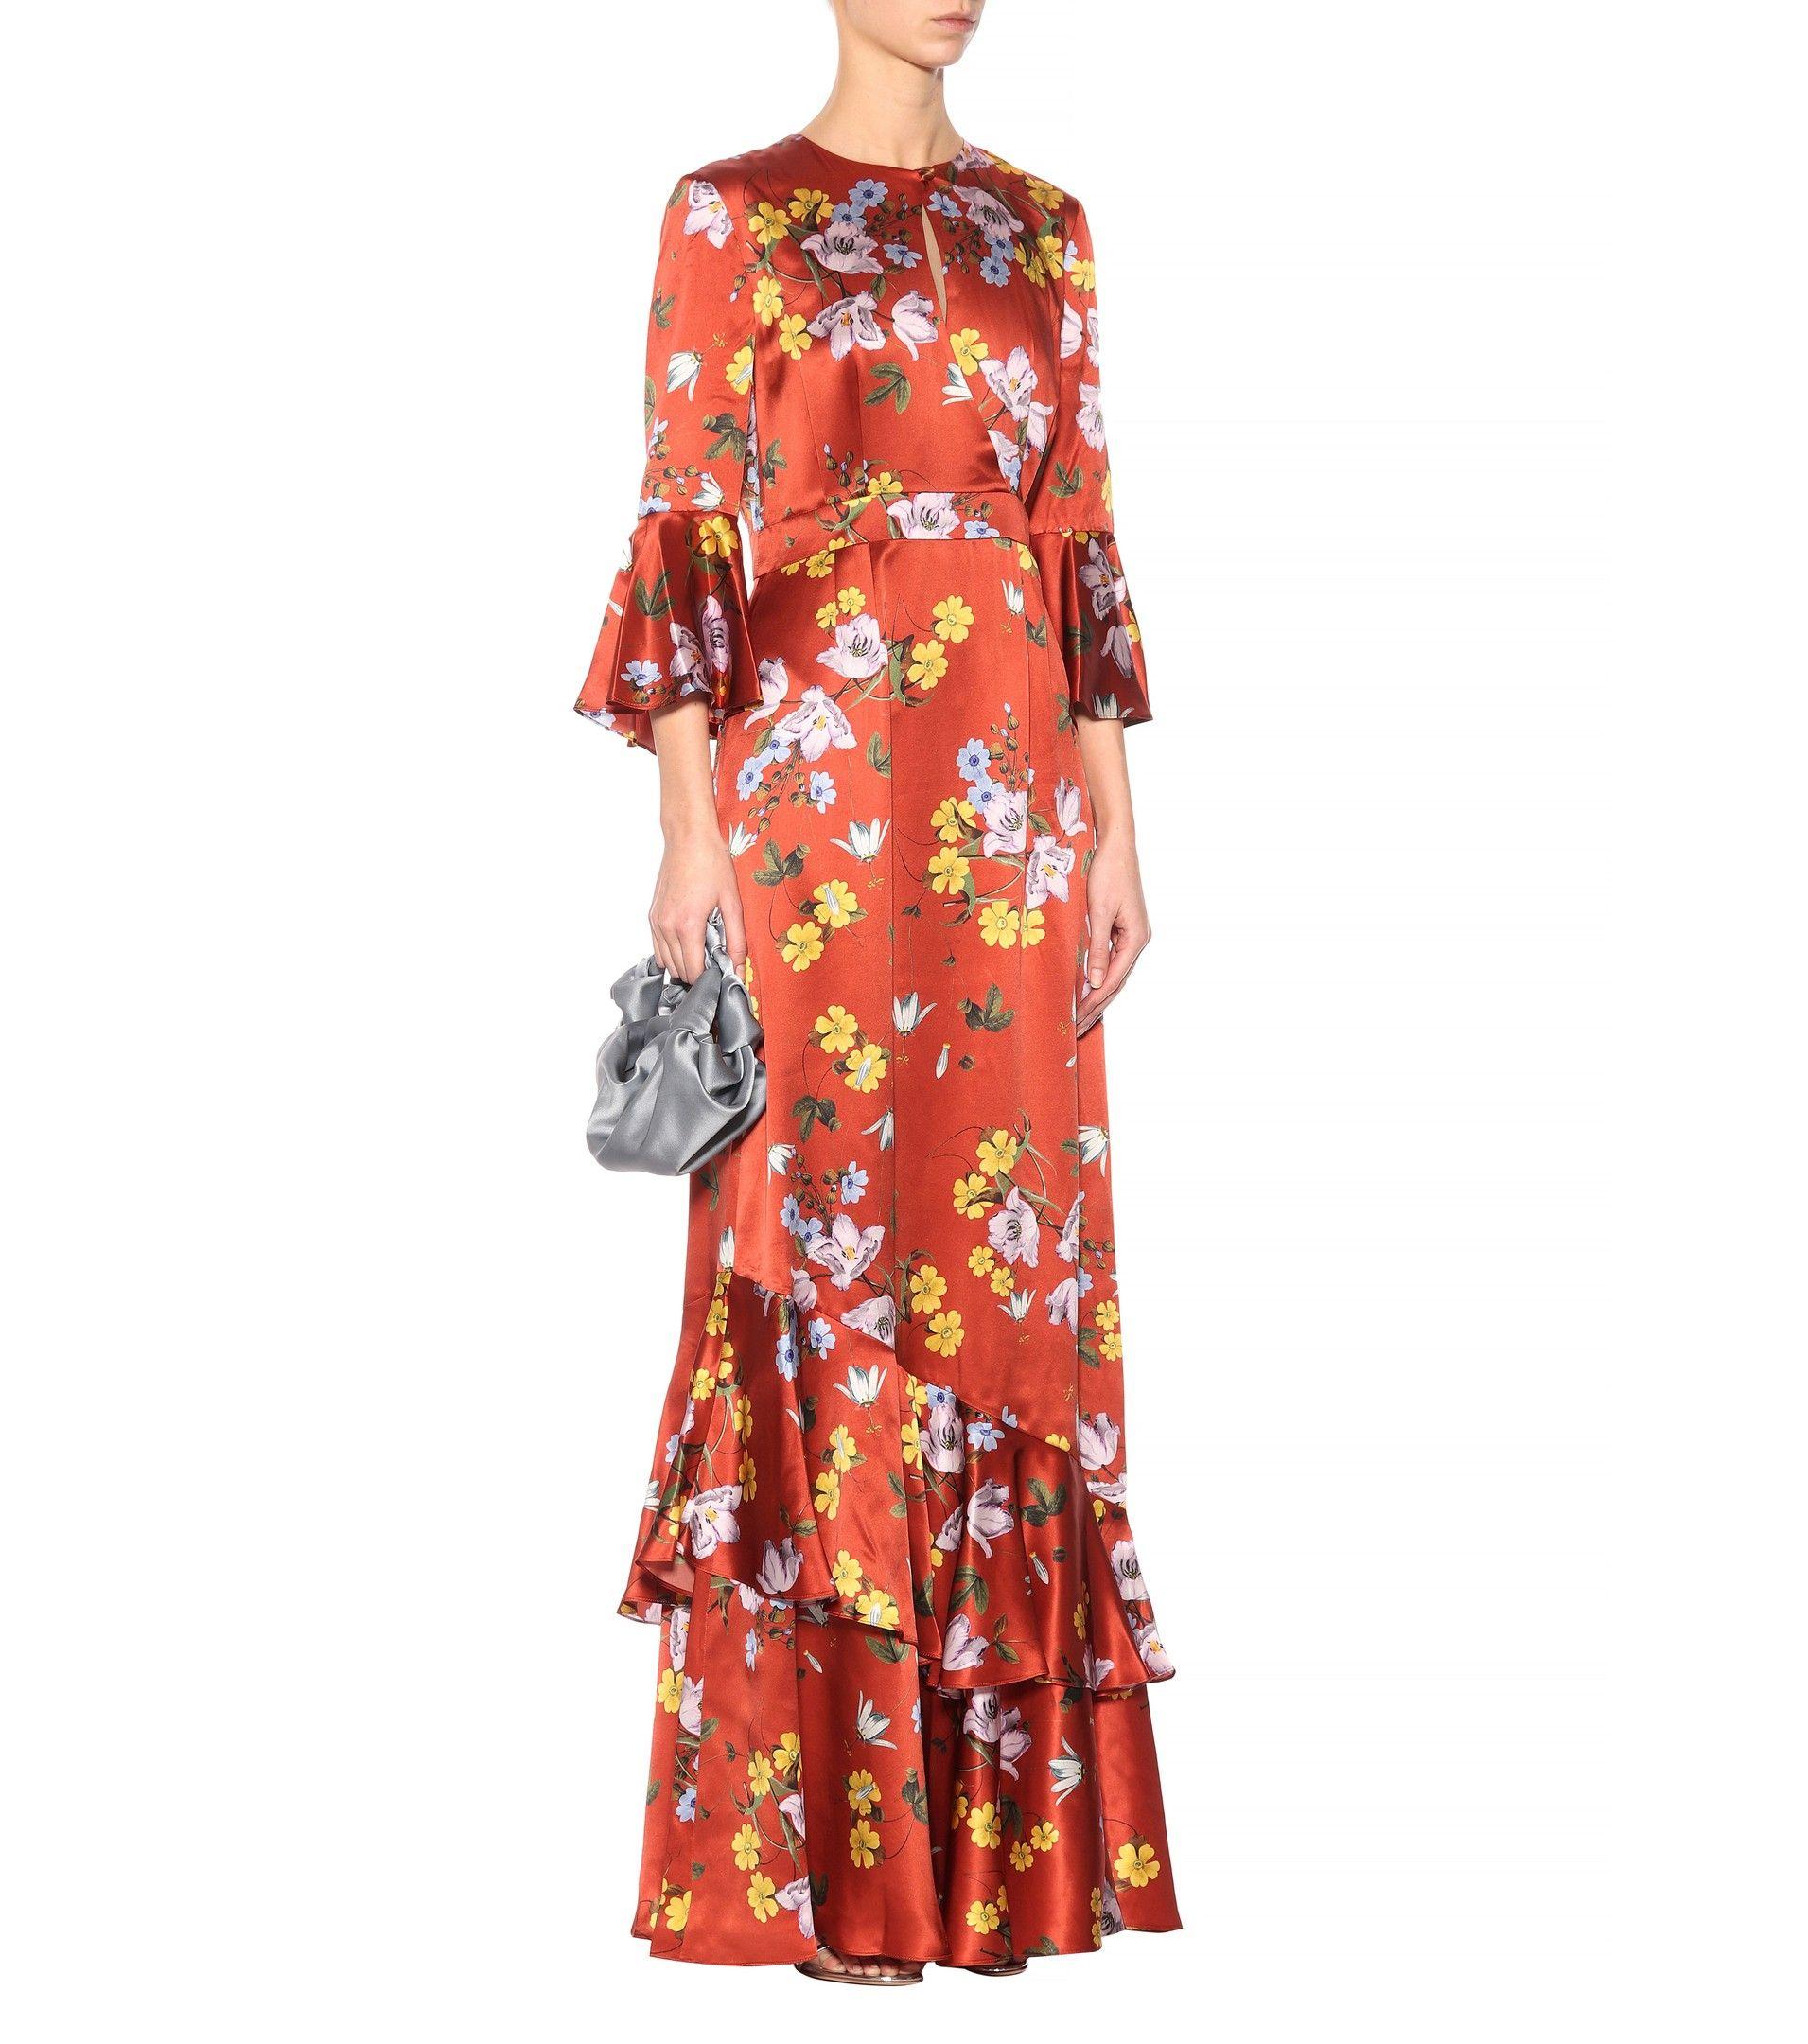 Venice Printed Silk Maxi Dress Erdem s3Hcm